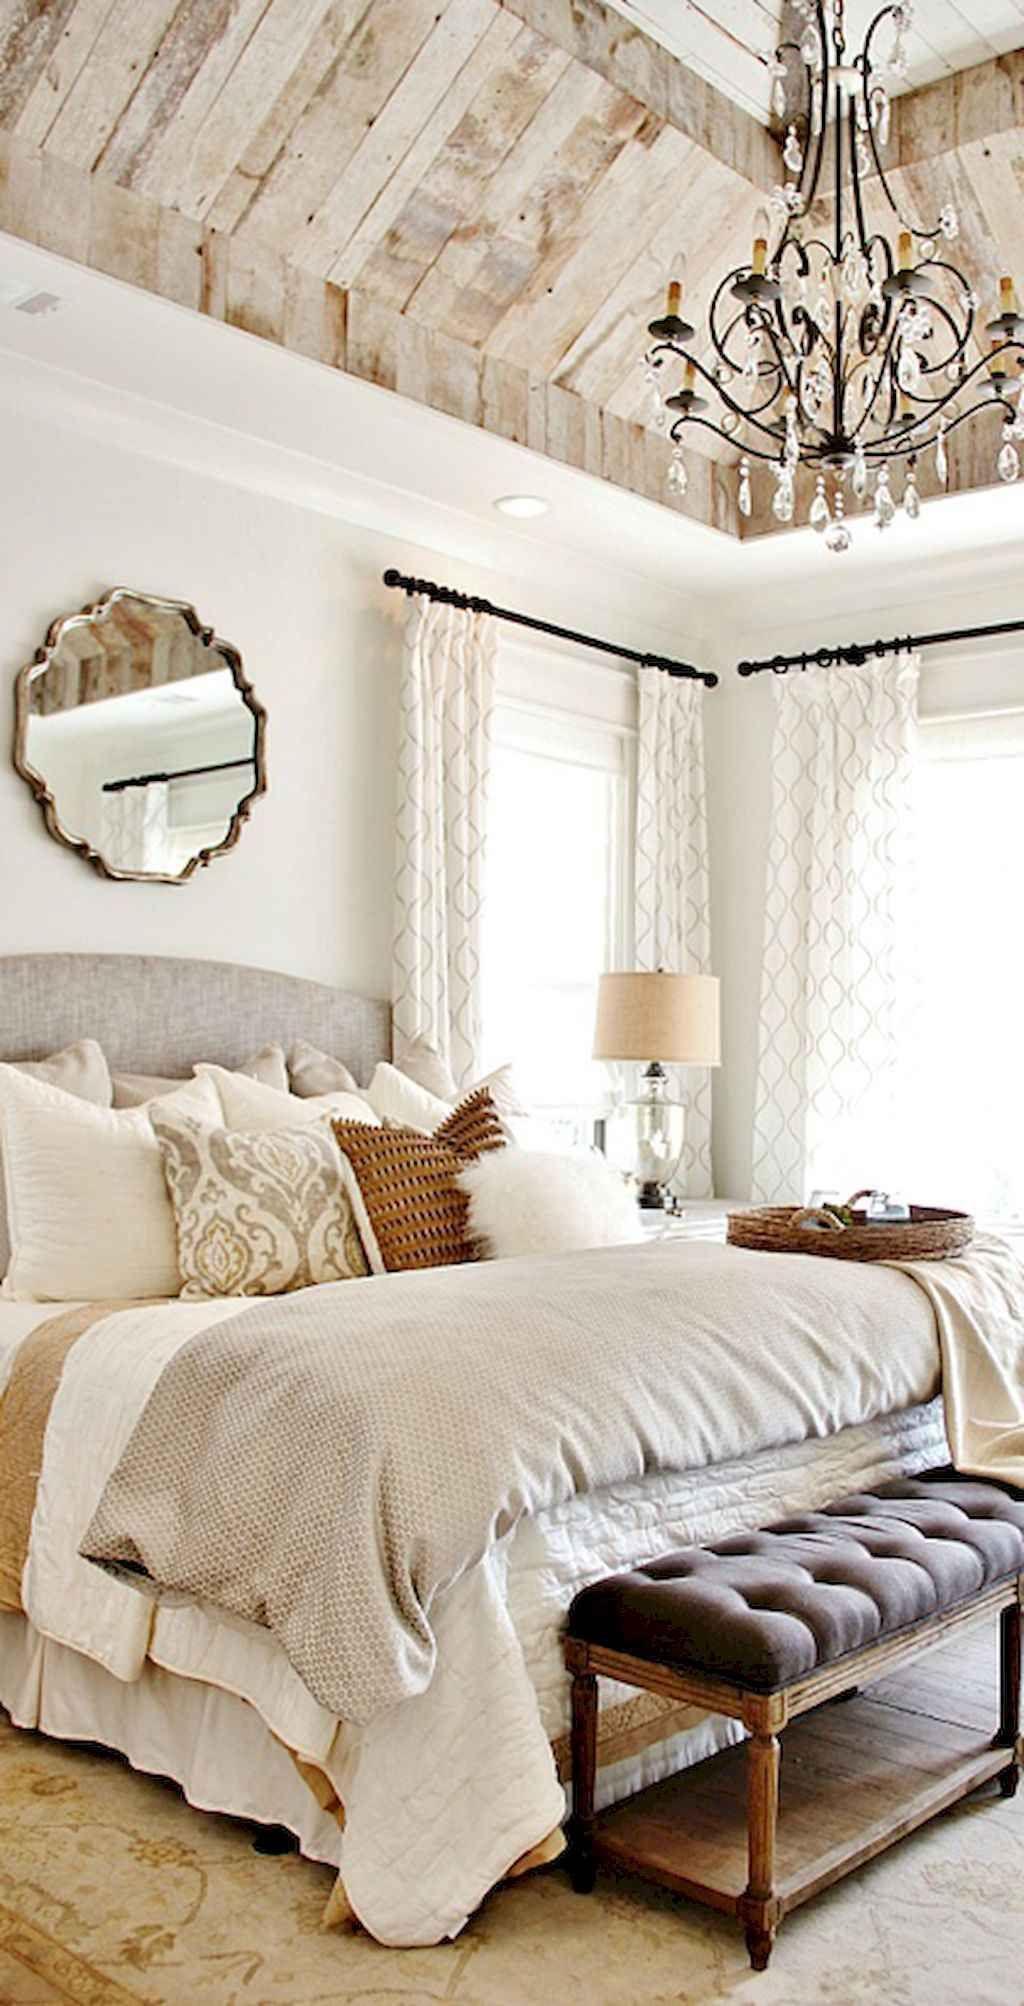 55 Farmhouse Master Bedroom Ideas